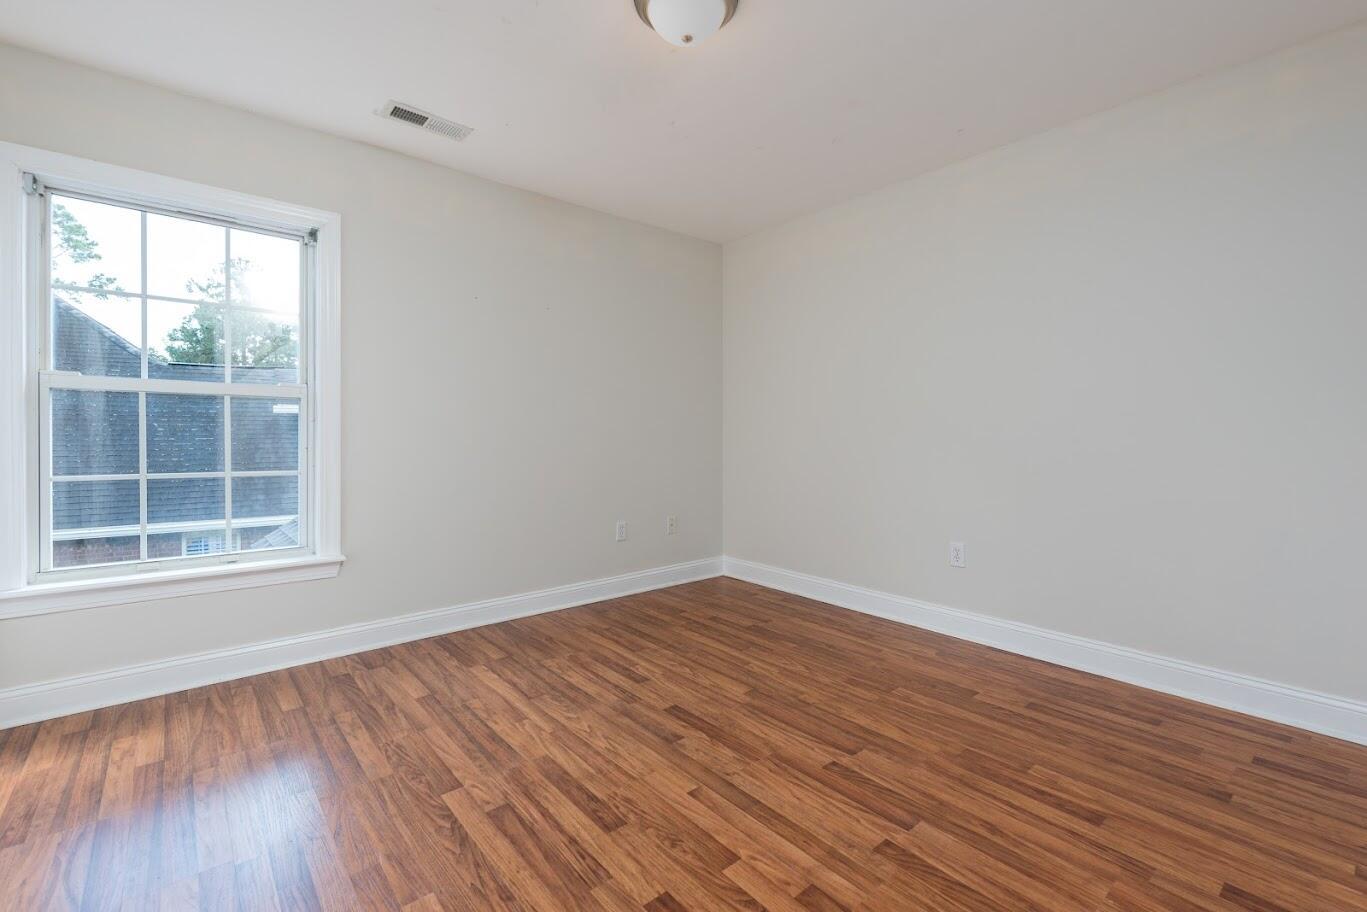 Lakeshore Homes For Sale - 1445 Waterside, Mount Pleasant, SC - 10